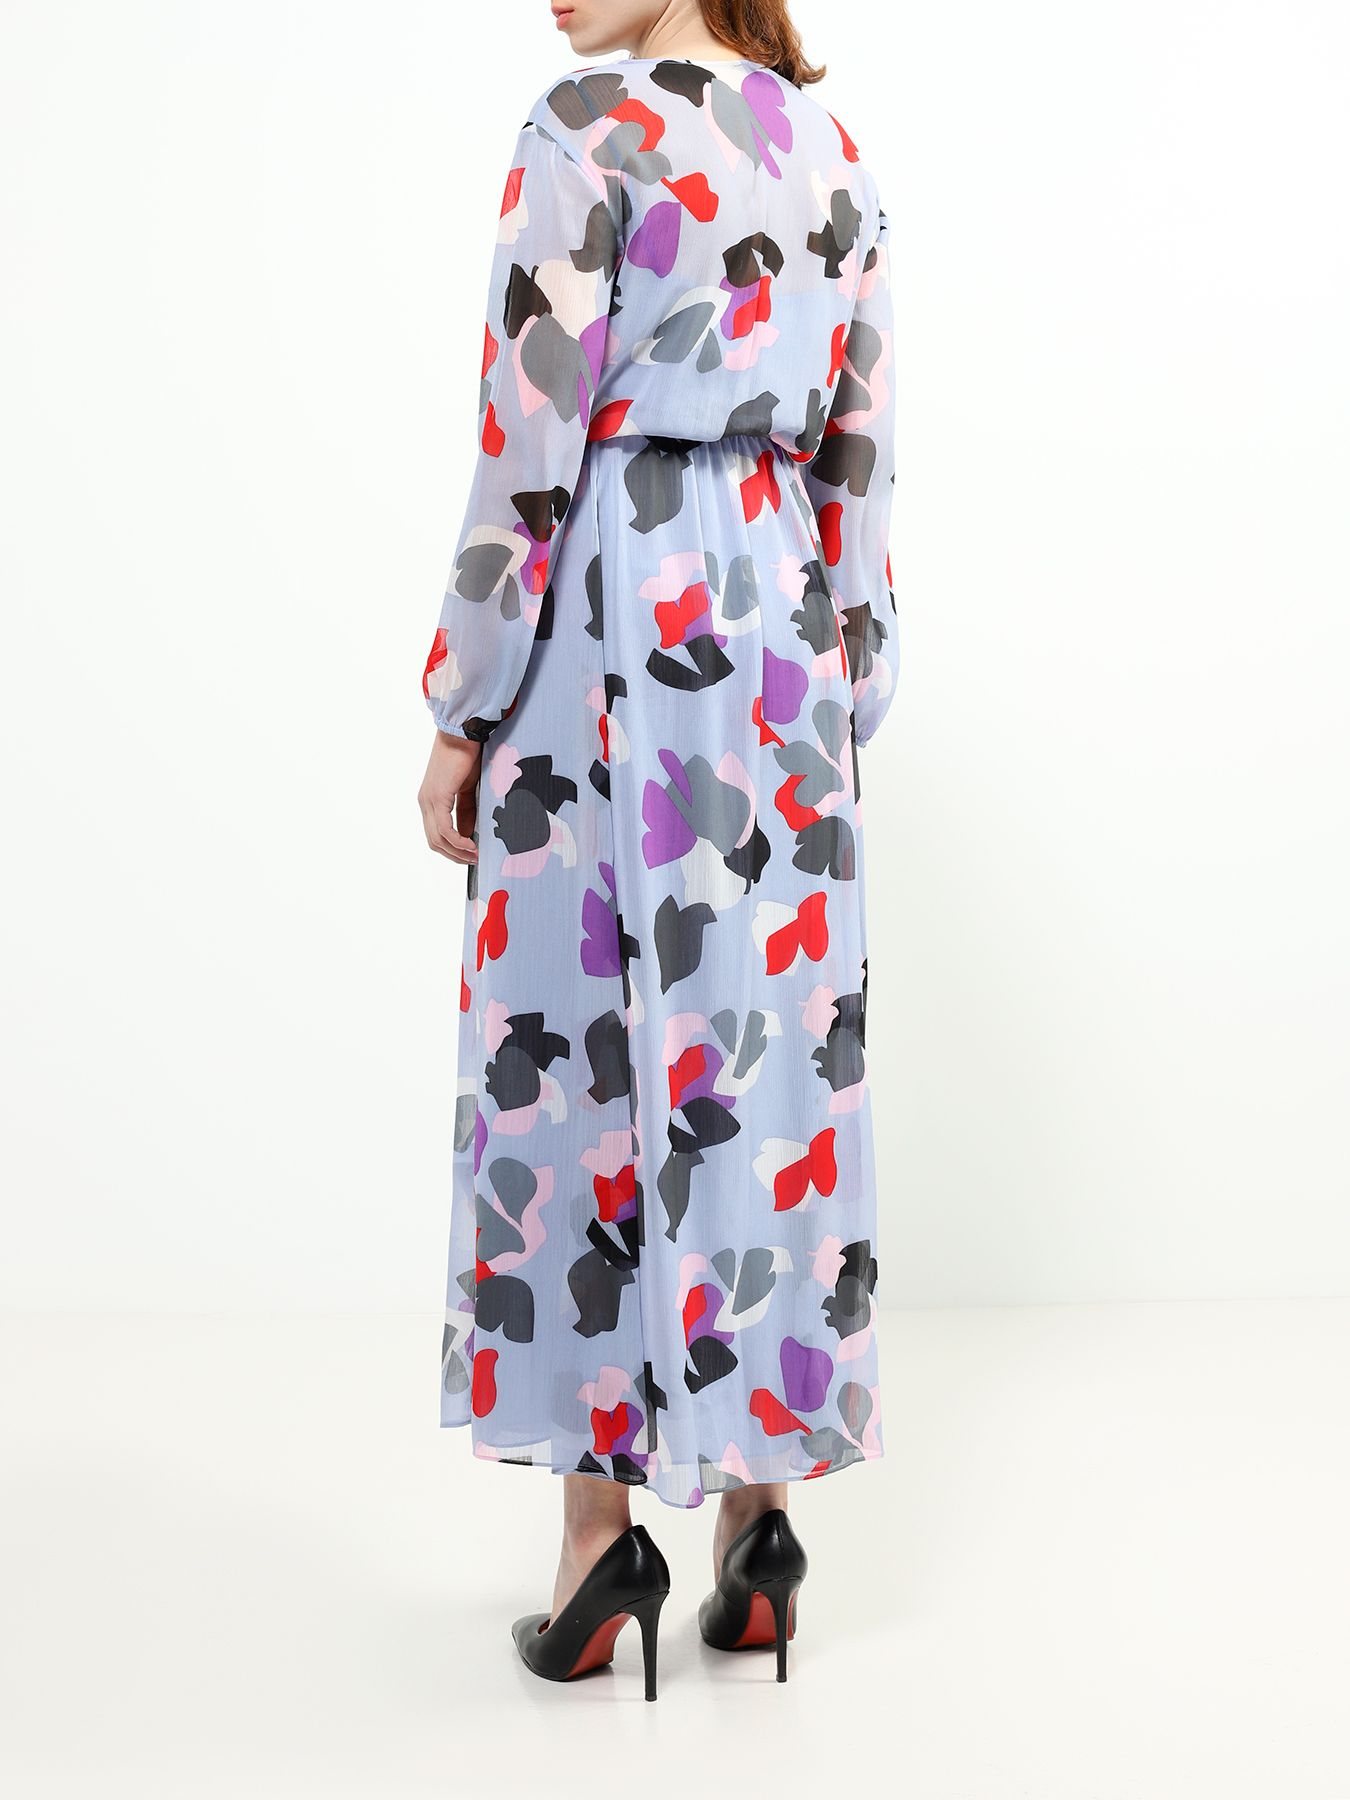 Платье Emporio Armani Платье легкое асимметричное платье emporio armani